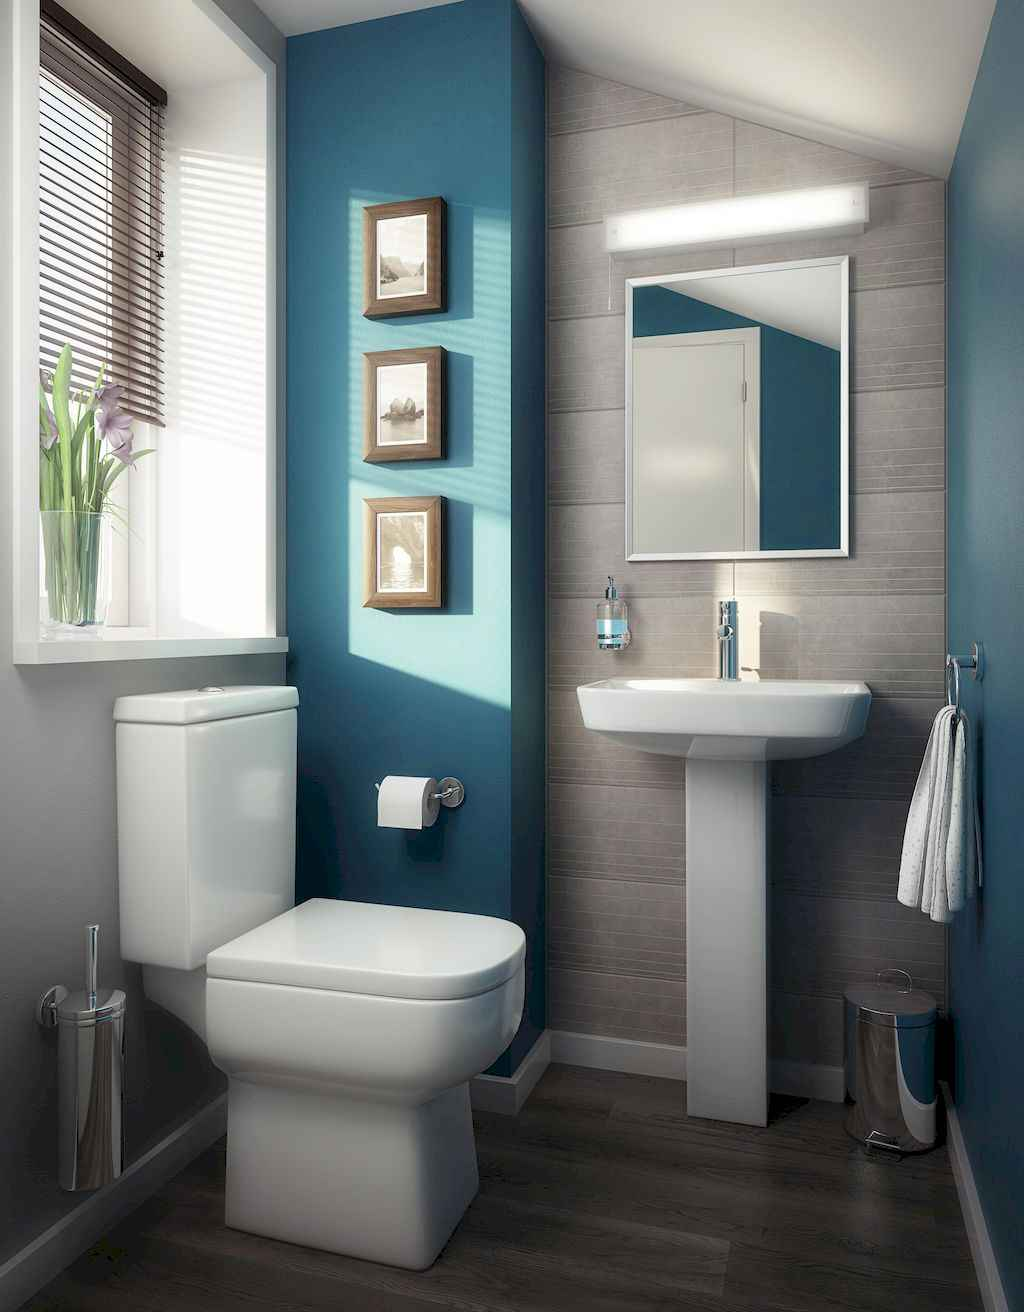 111 Brilliant Small Bathroom Remodel Ideas On A Budget (40)